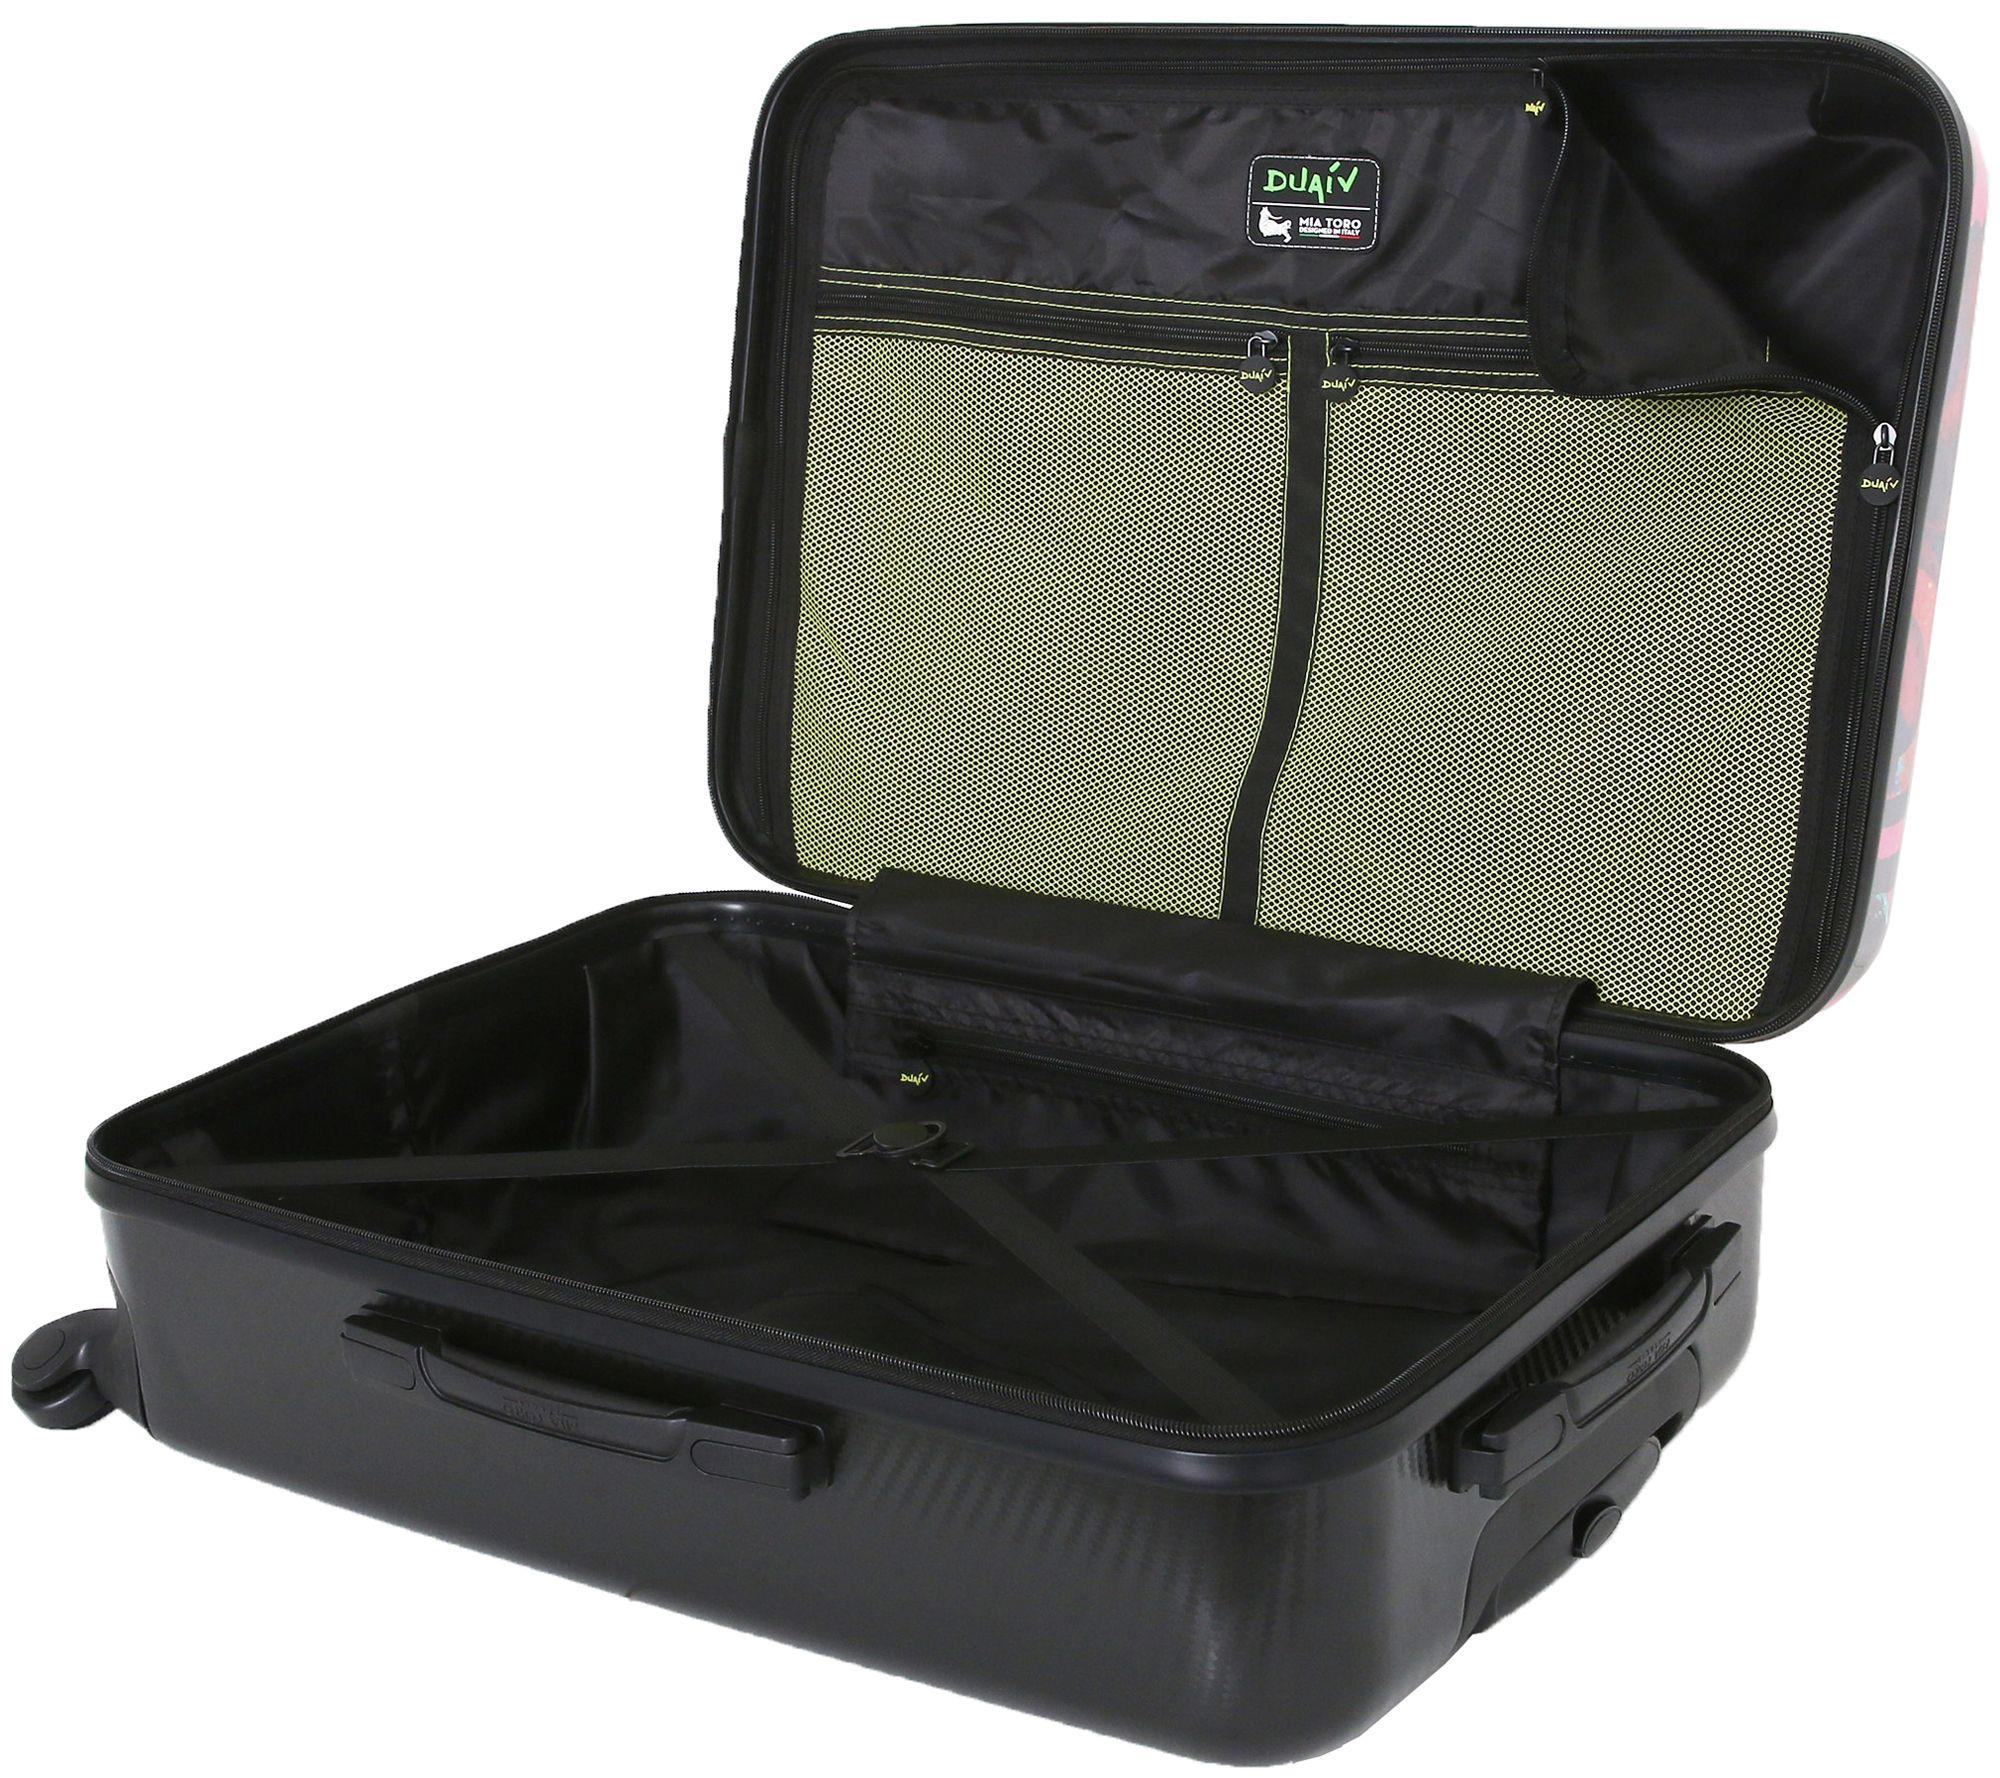 Mia Toro Italy Duaiv Hardside Spinner Luggage 3 Piece Set,zebre